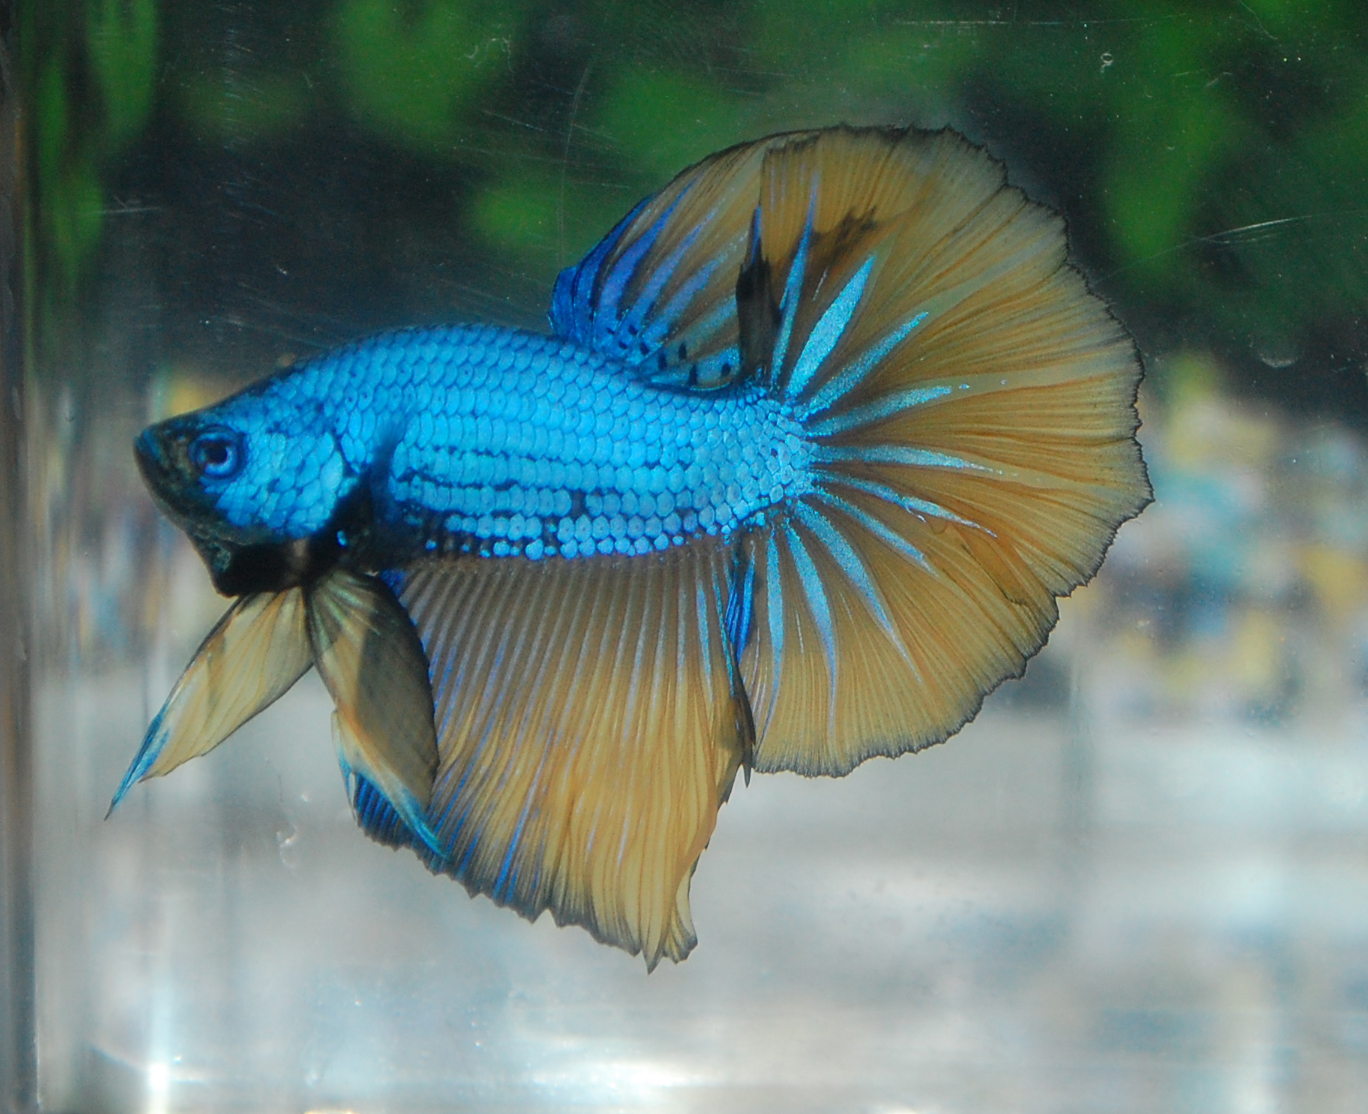 Betta fish afira halfmoon blue mustard dragon sold out for Halfmoon betta fish